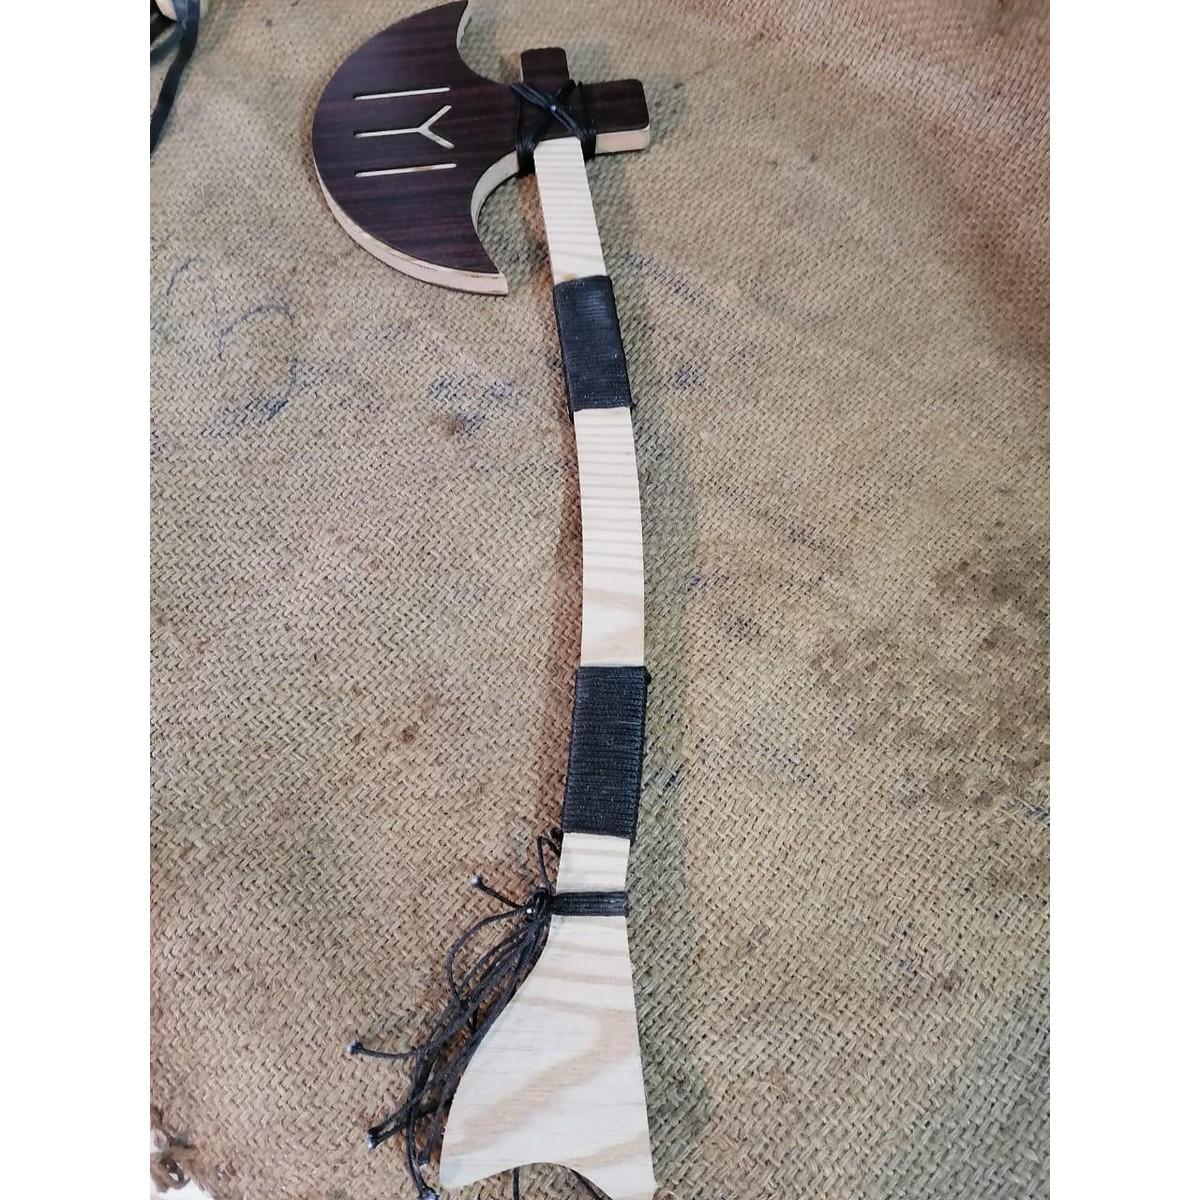 turgut wooden axe  toy size 24 inch ,Kids Gift